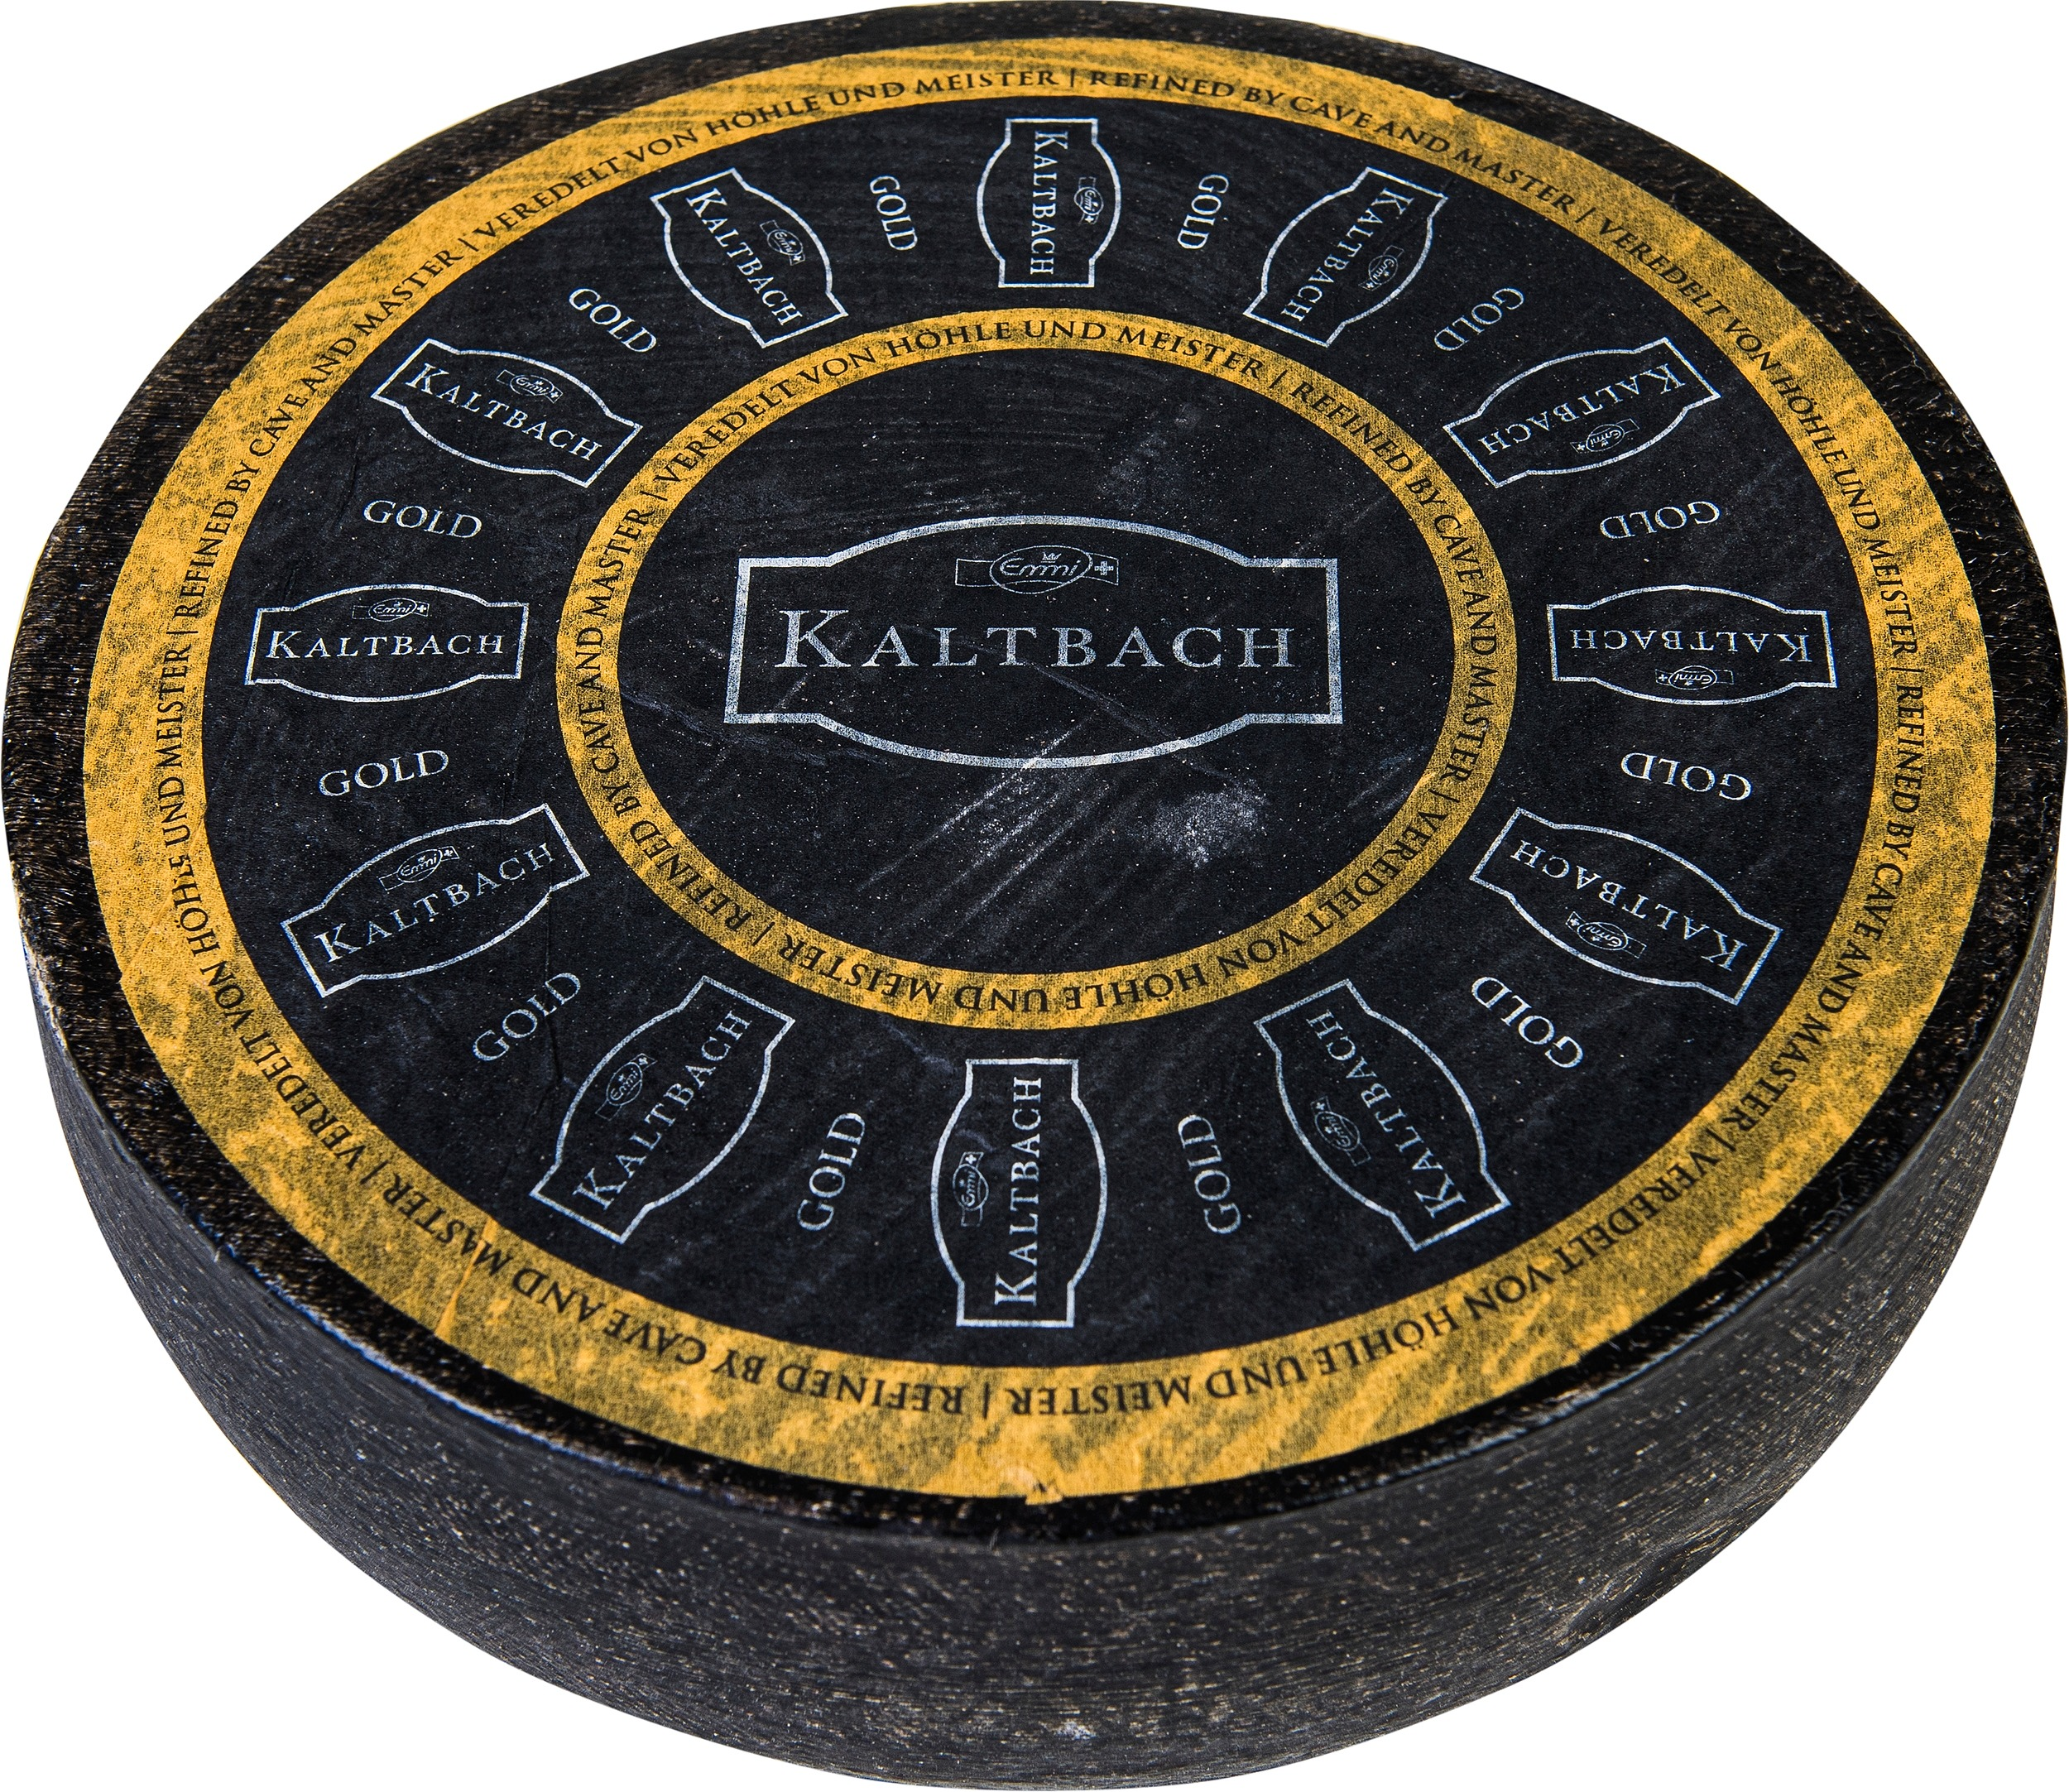 Kaltbach gold 31% hårdost